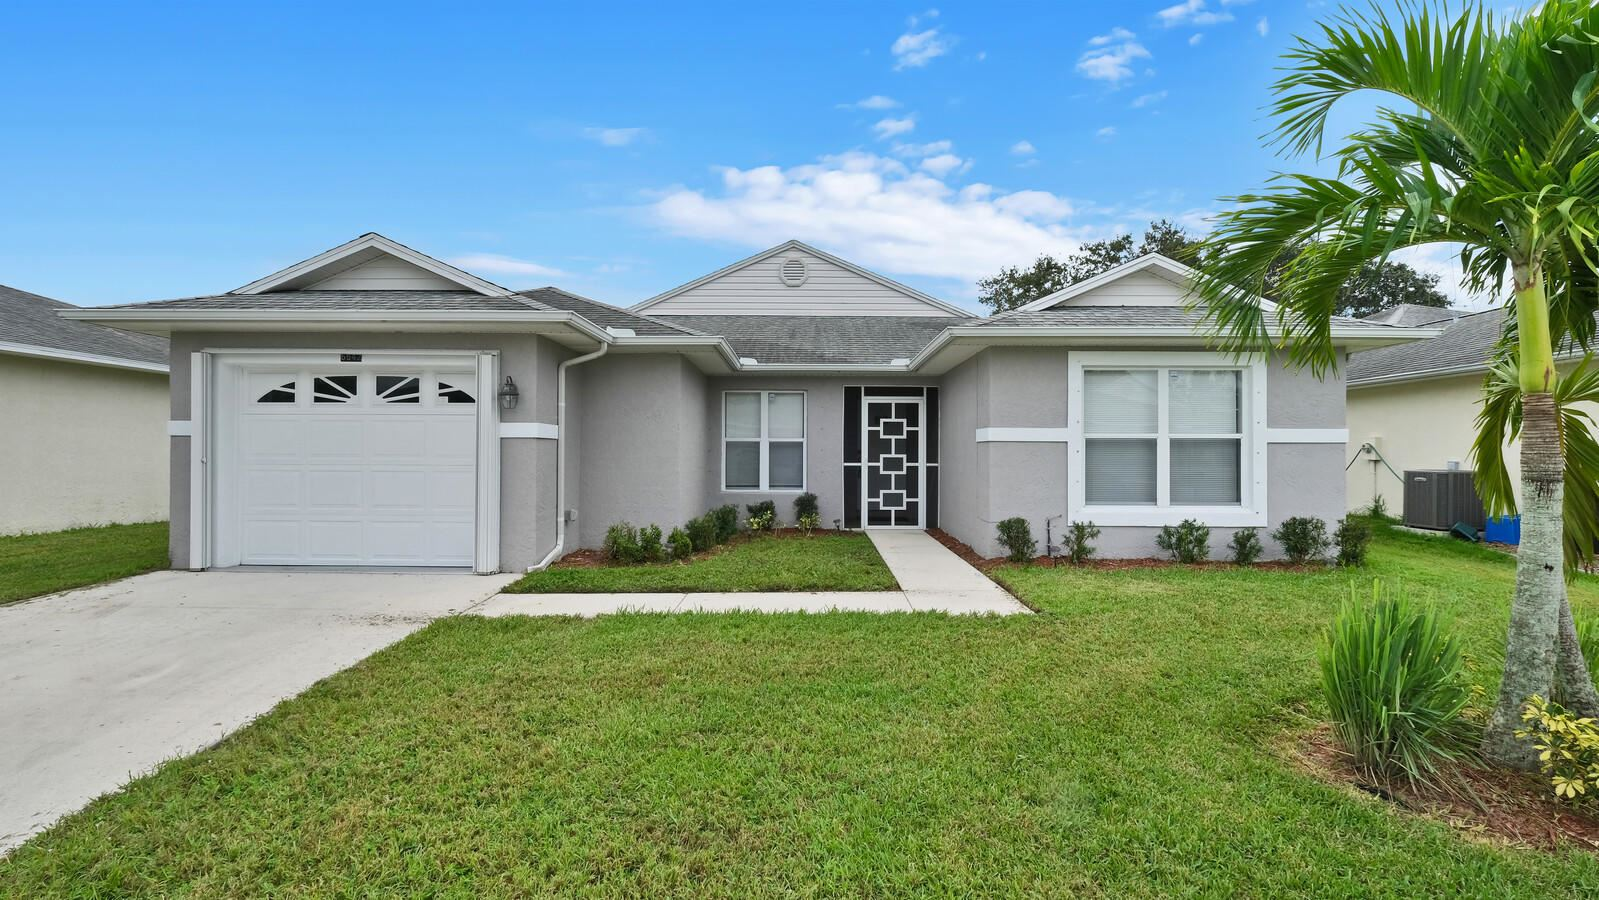 6642 Nuevo Lagos Street, Fort Pierce, FL 34951 - #: RX-10659967